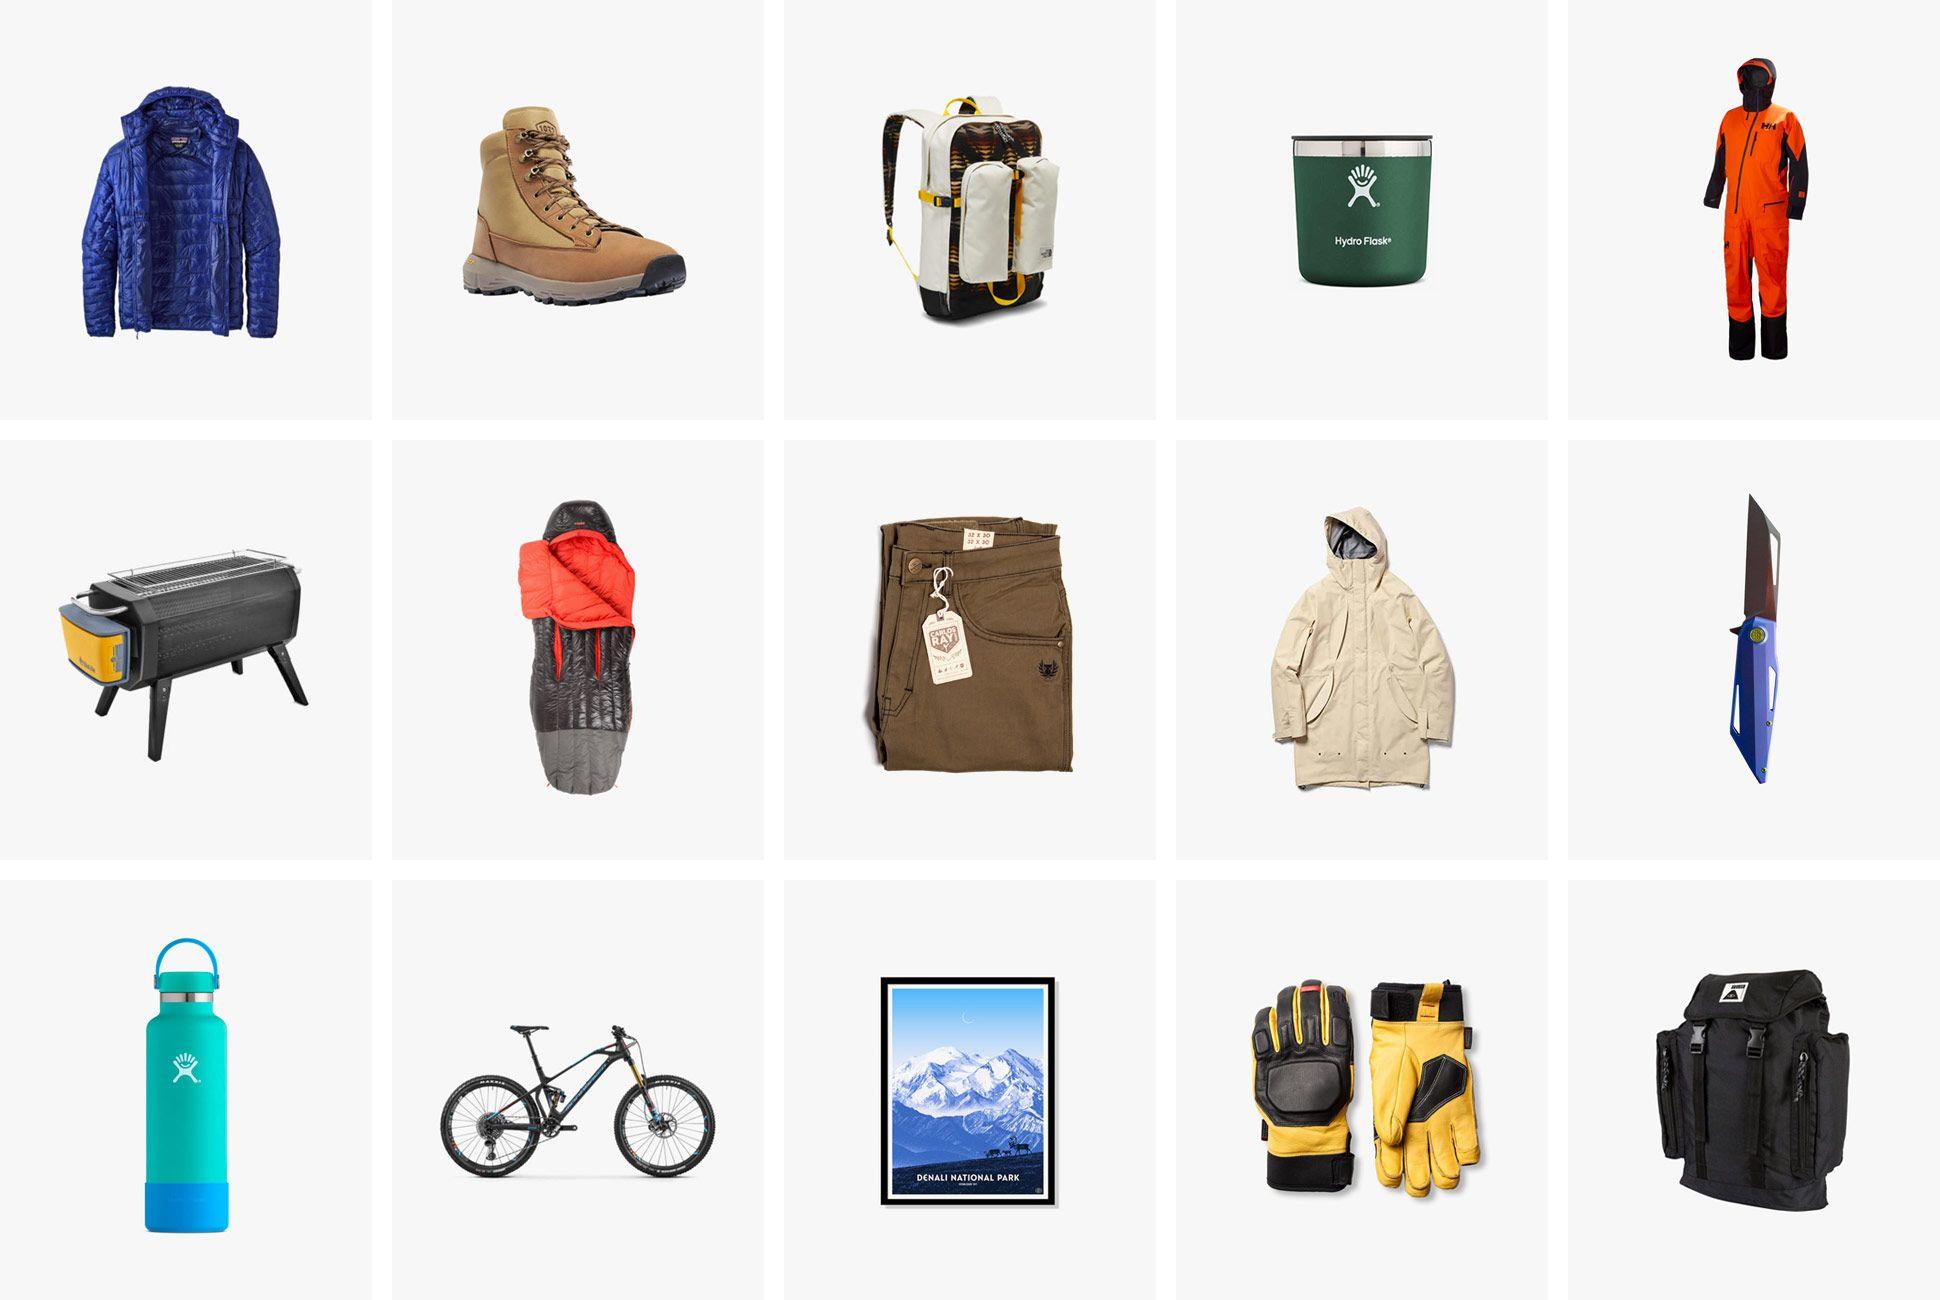 Peachy 50 New And Notable Outdoor Products Released In 2017 Gear Inzonedesignstudio Interior Chair Design Inzonedesignstudiocom